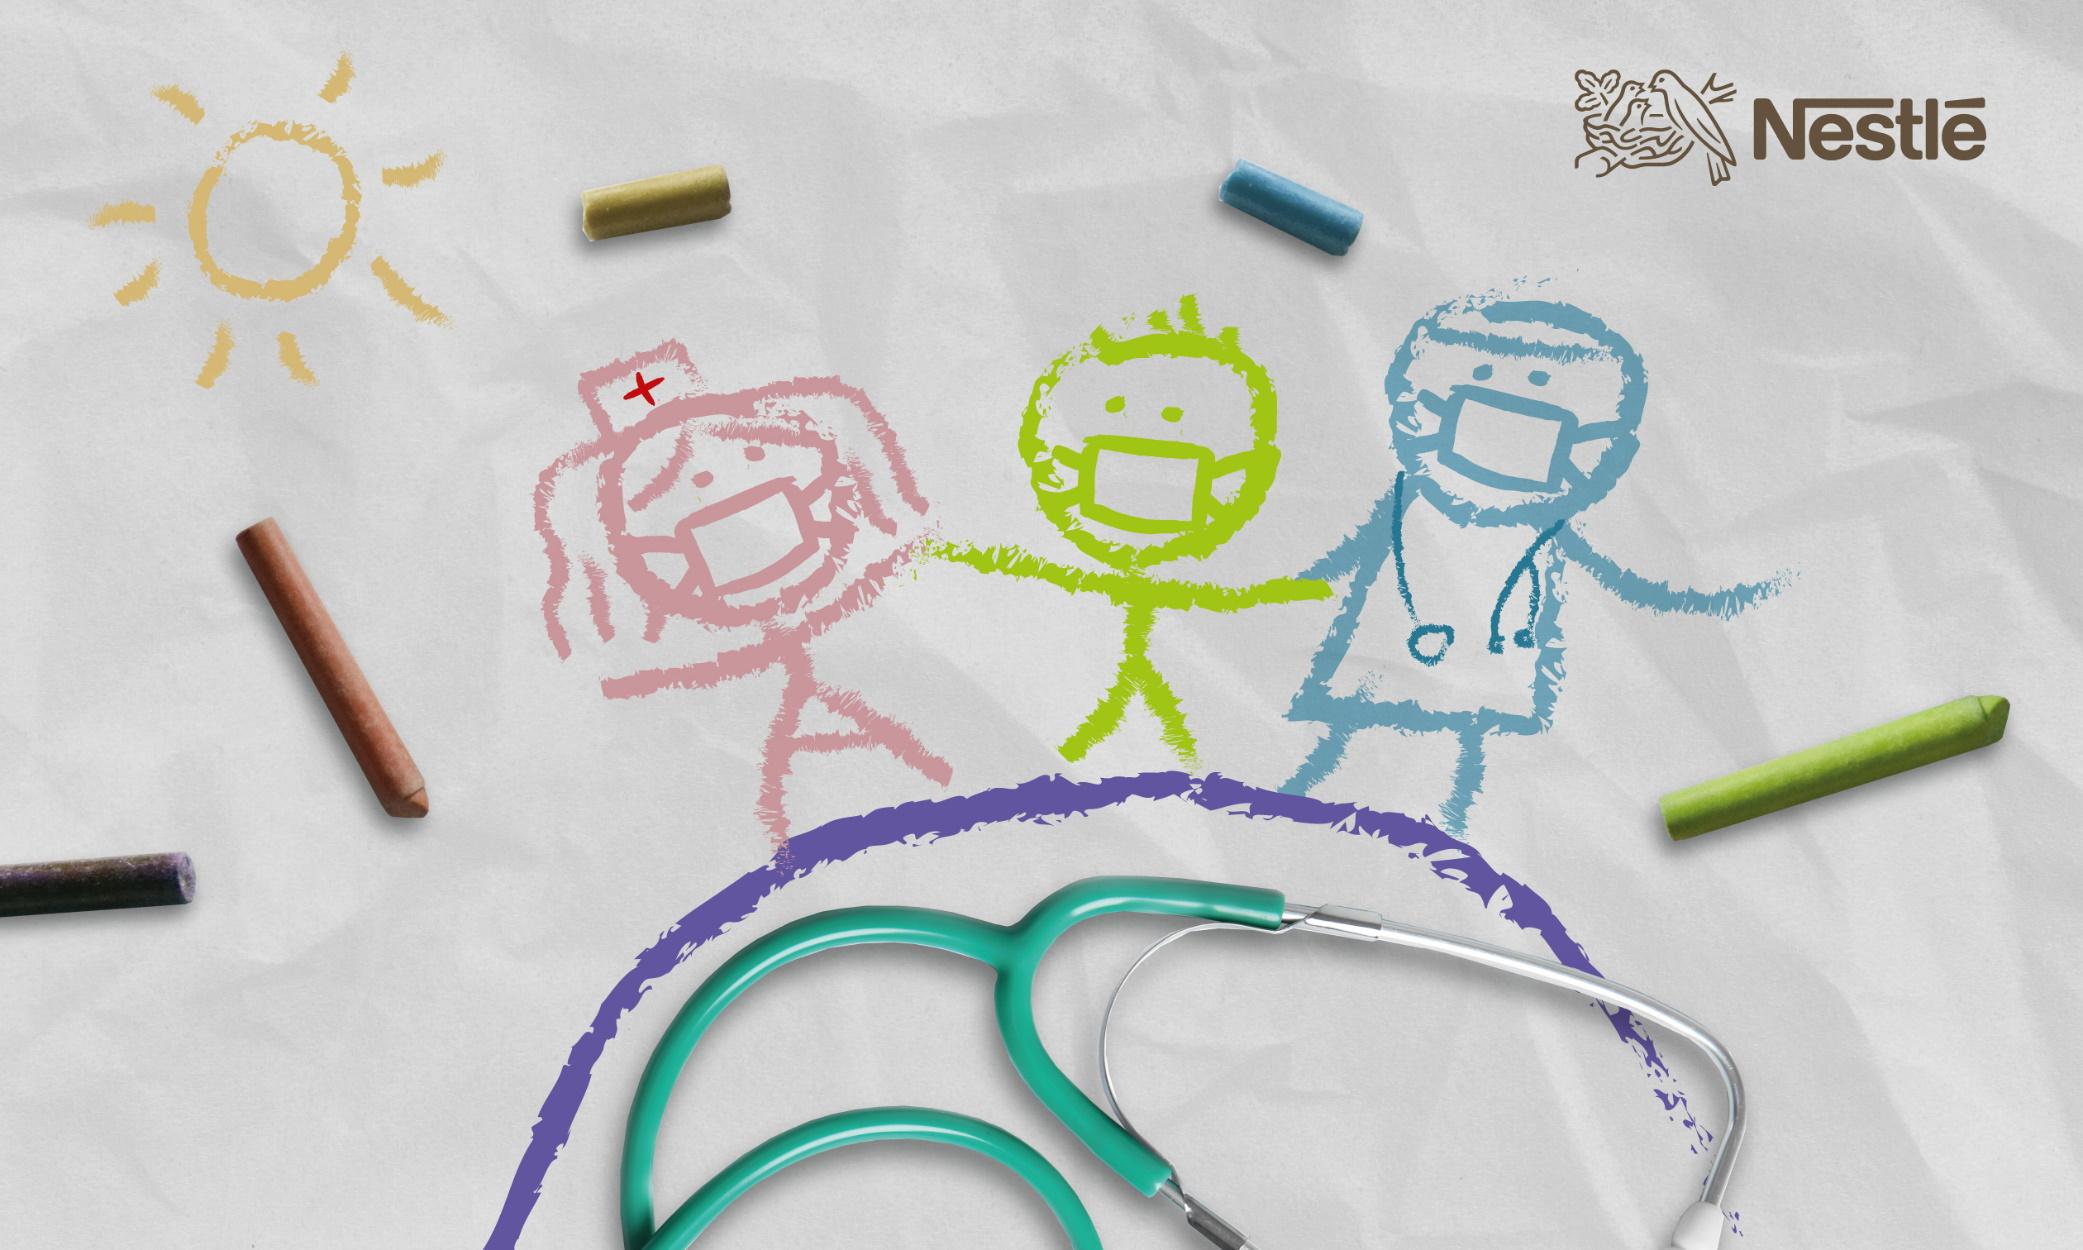 Nestlé Ελλάς: Δωρεά 6 ΜΕΘ στο Νοσοκομείο Παίδων «Η Αγία Σοφία»